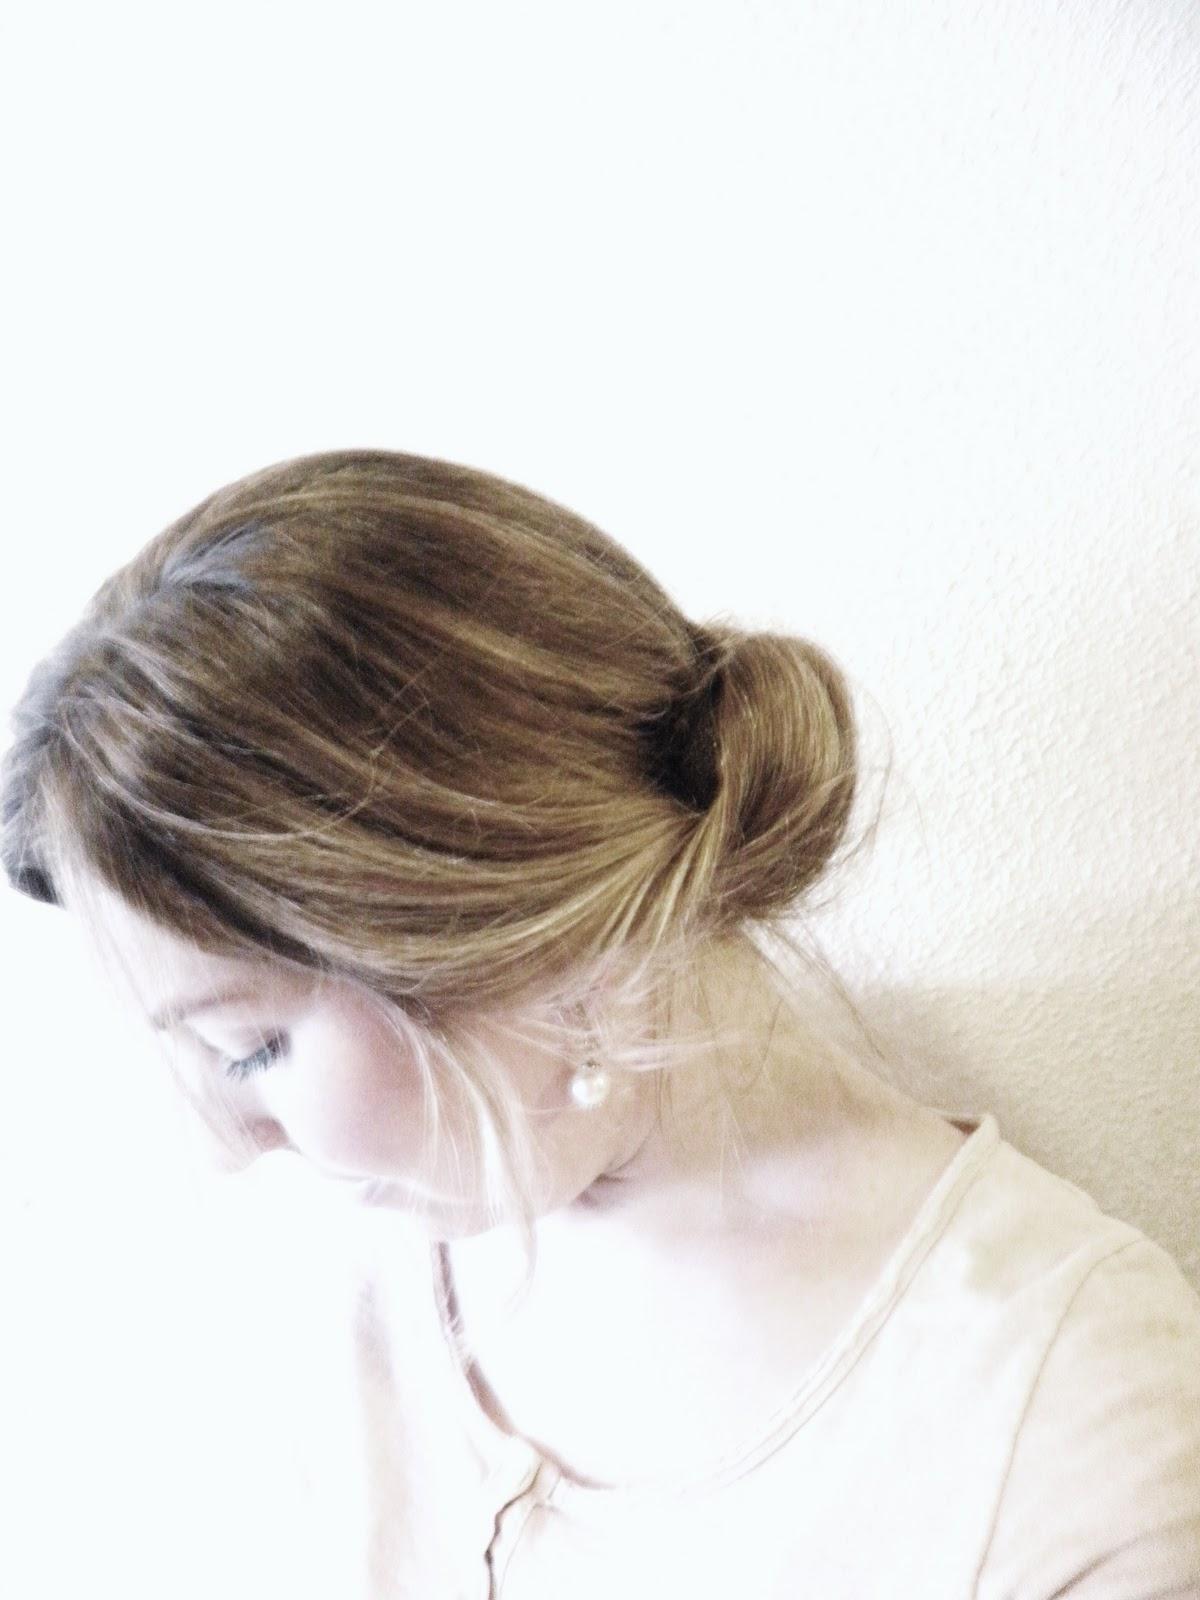 hår pølse